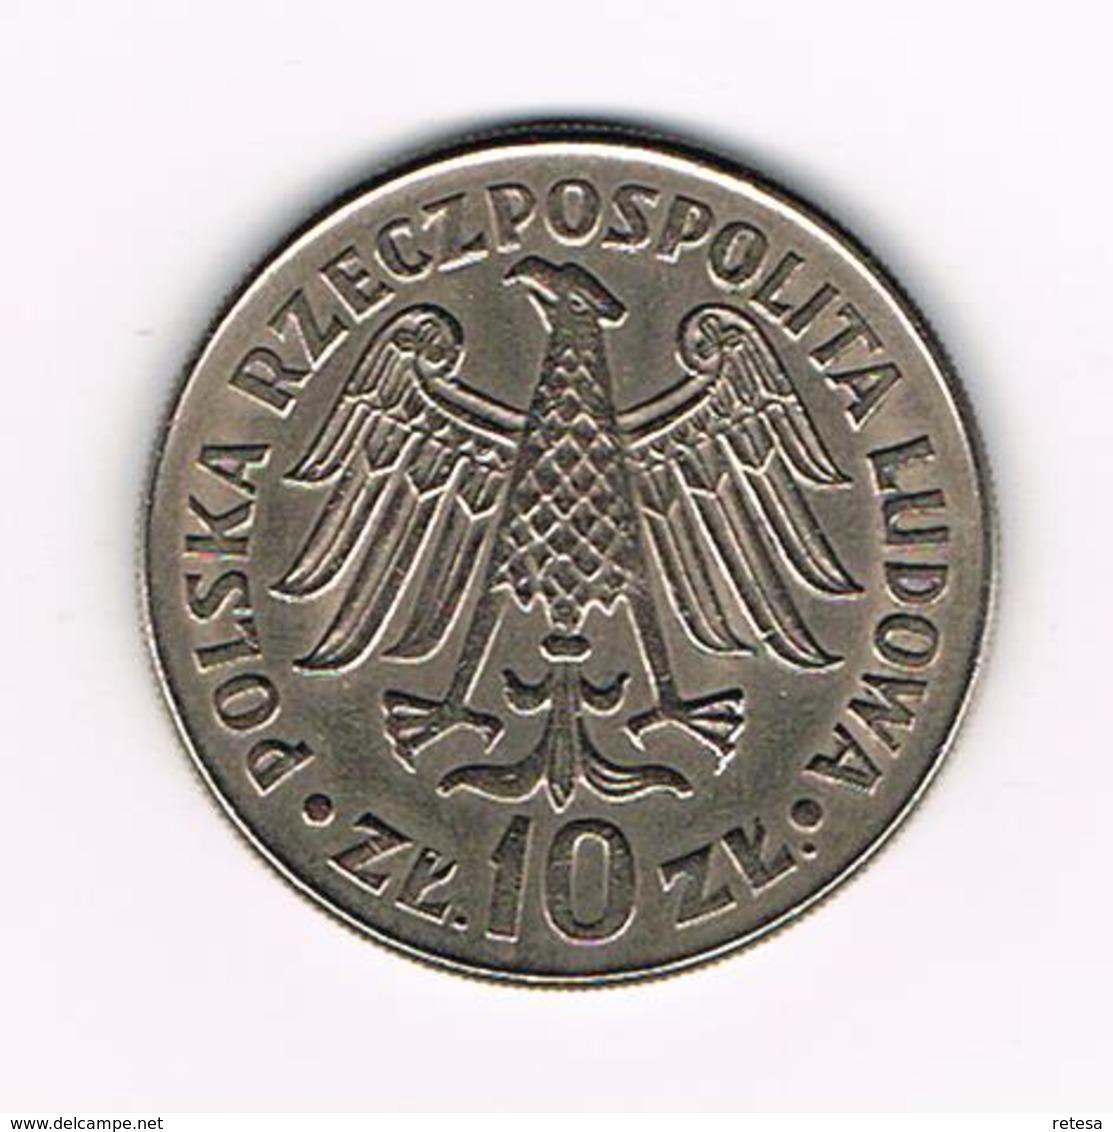 ¨¨ POLEN  10 ZLOTYCH  1964 - 600th ANNIVERSARY Of JAGIELLO  UNIVERSITY - Pologne